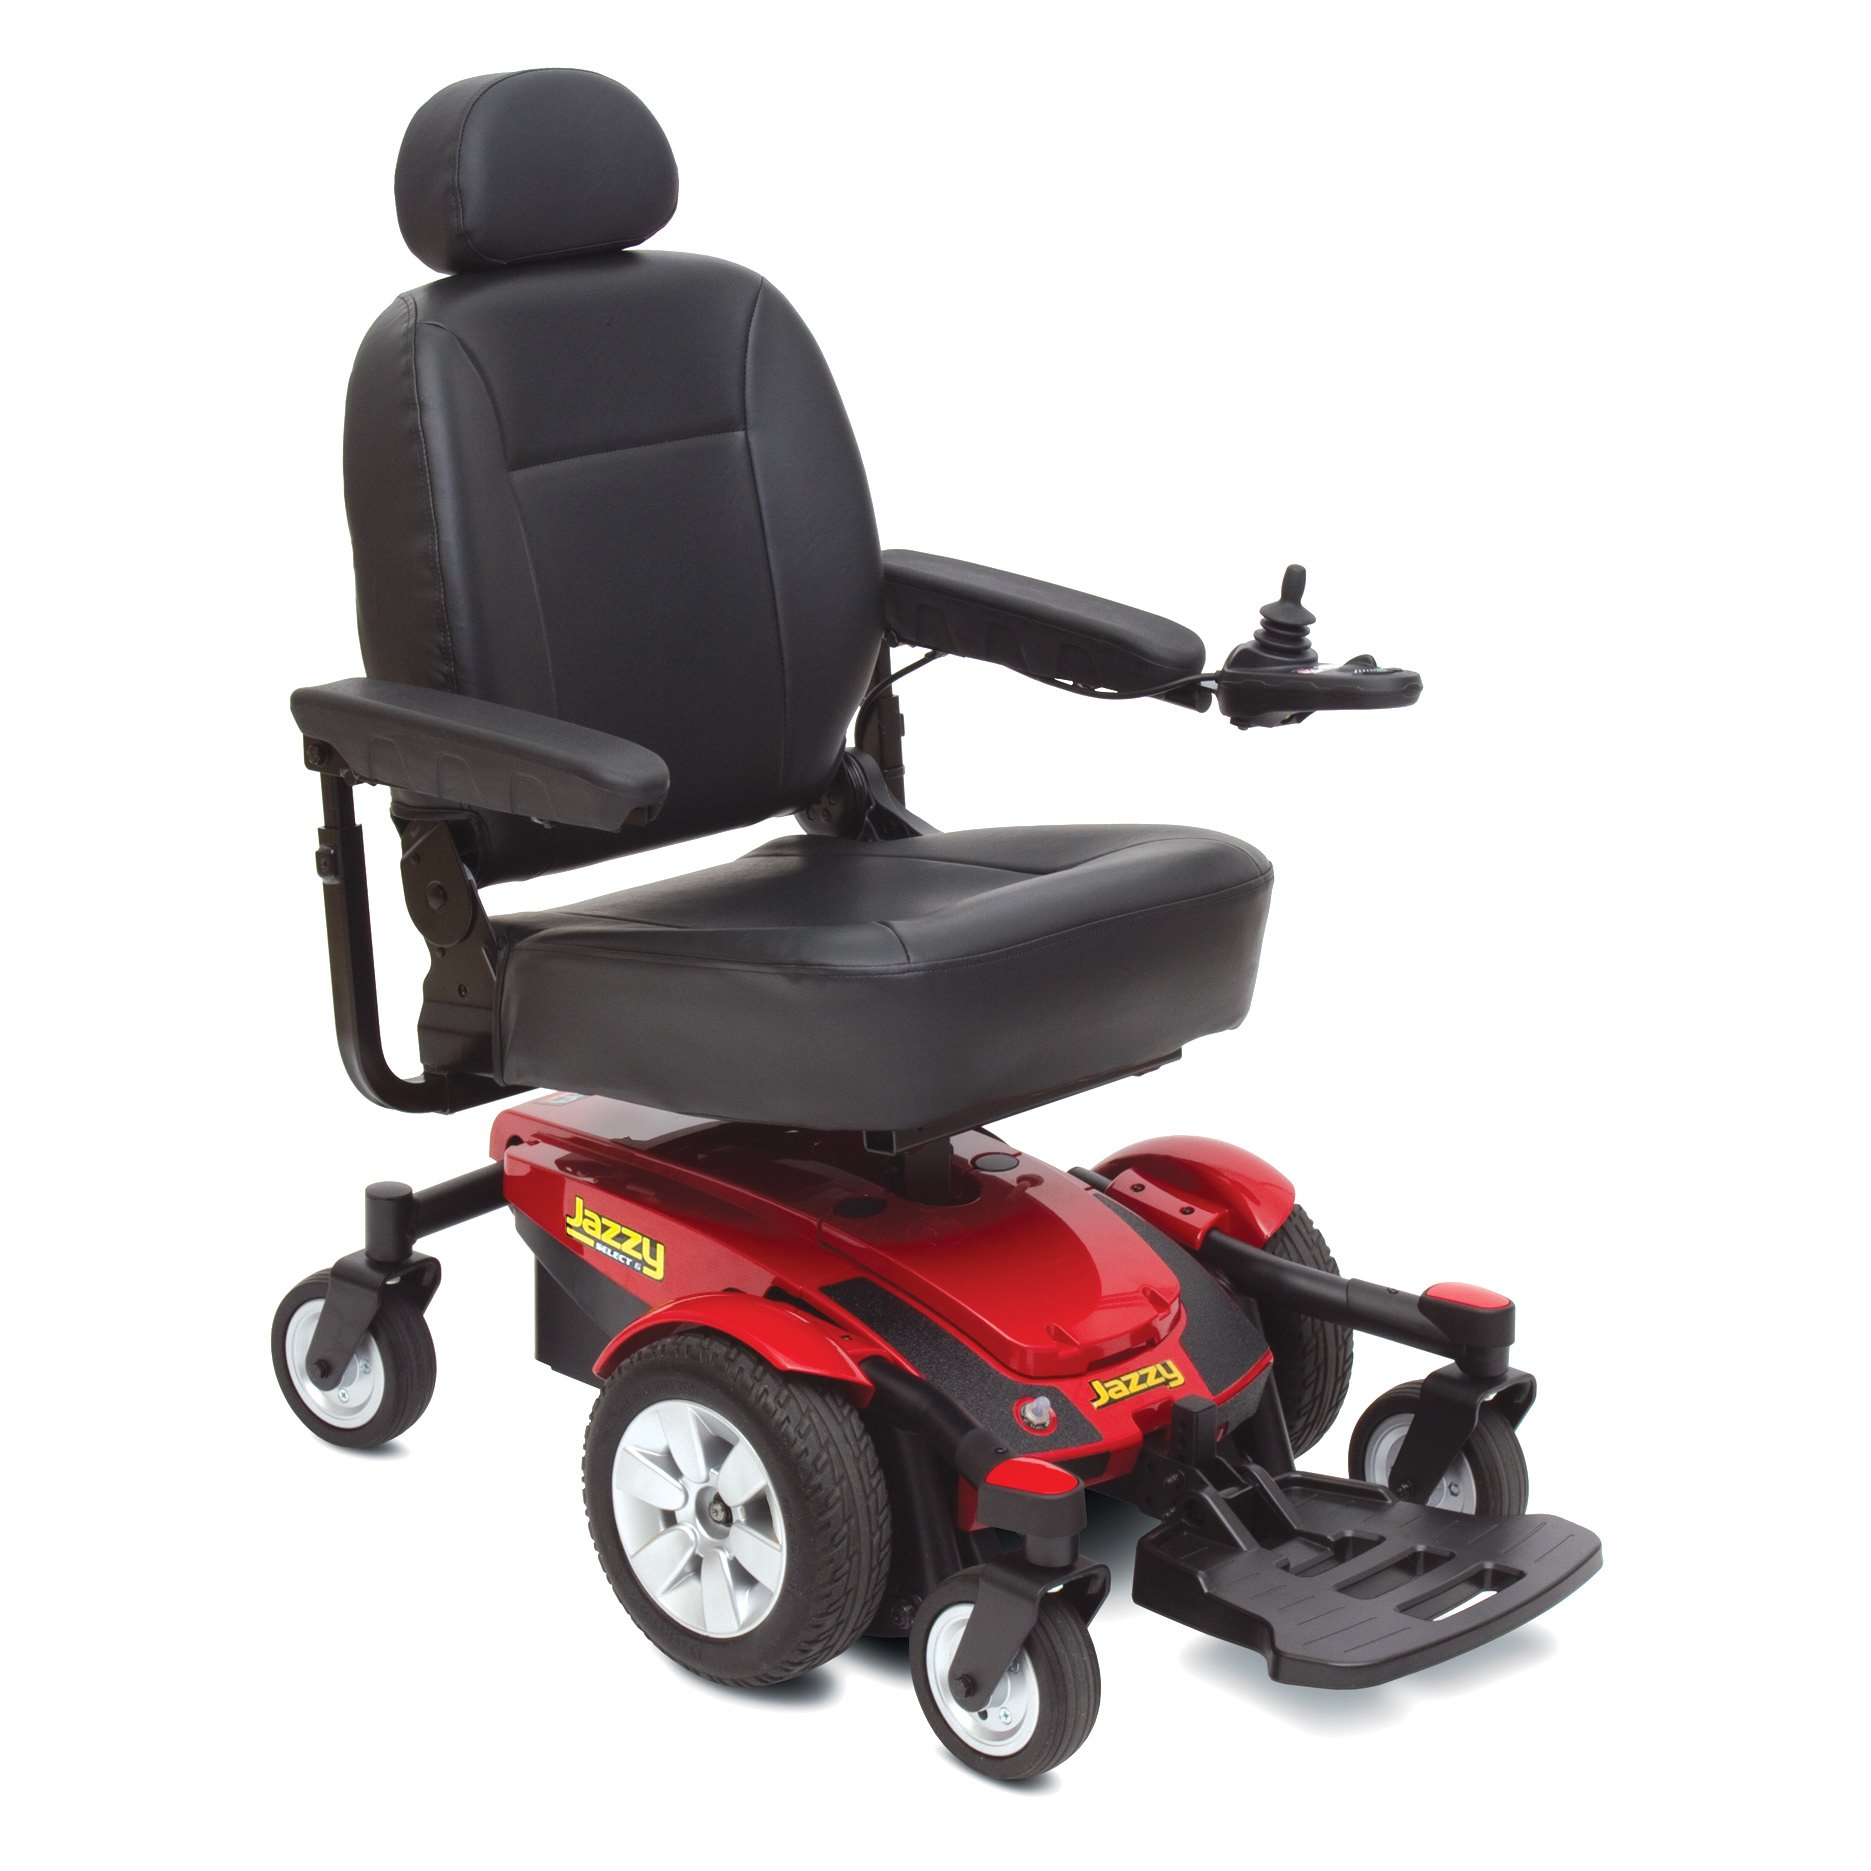 Power Wheelchair | Rental | Purchase | Repair - Los Angeles, South Bay, Carson, Torrance, San Pedro, Palos Verdes, Santa Monica, Lomita, Long Beach, Redondo Beach, Harbor City, Compton, Gardena, Hawthorne, Manhattan Beach, El Segundo